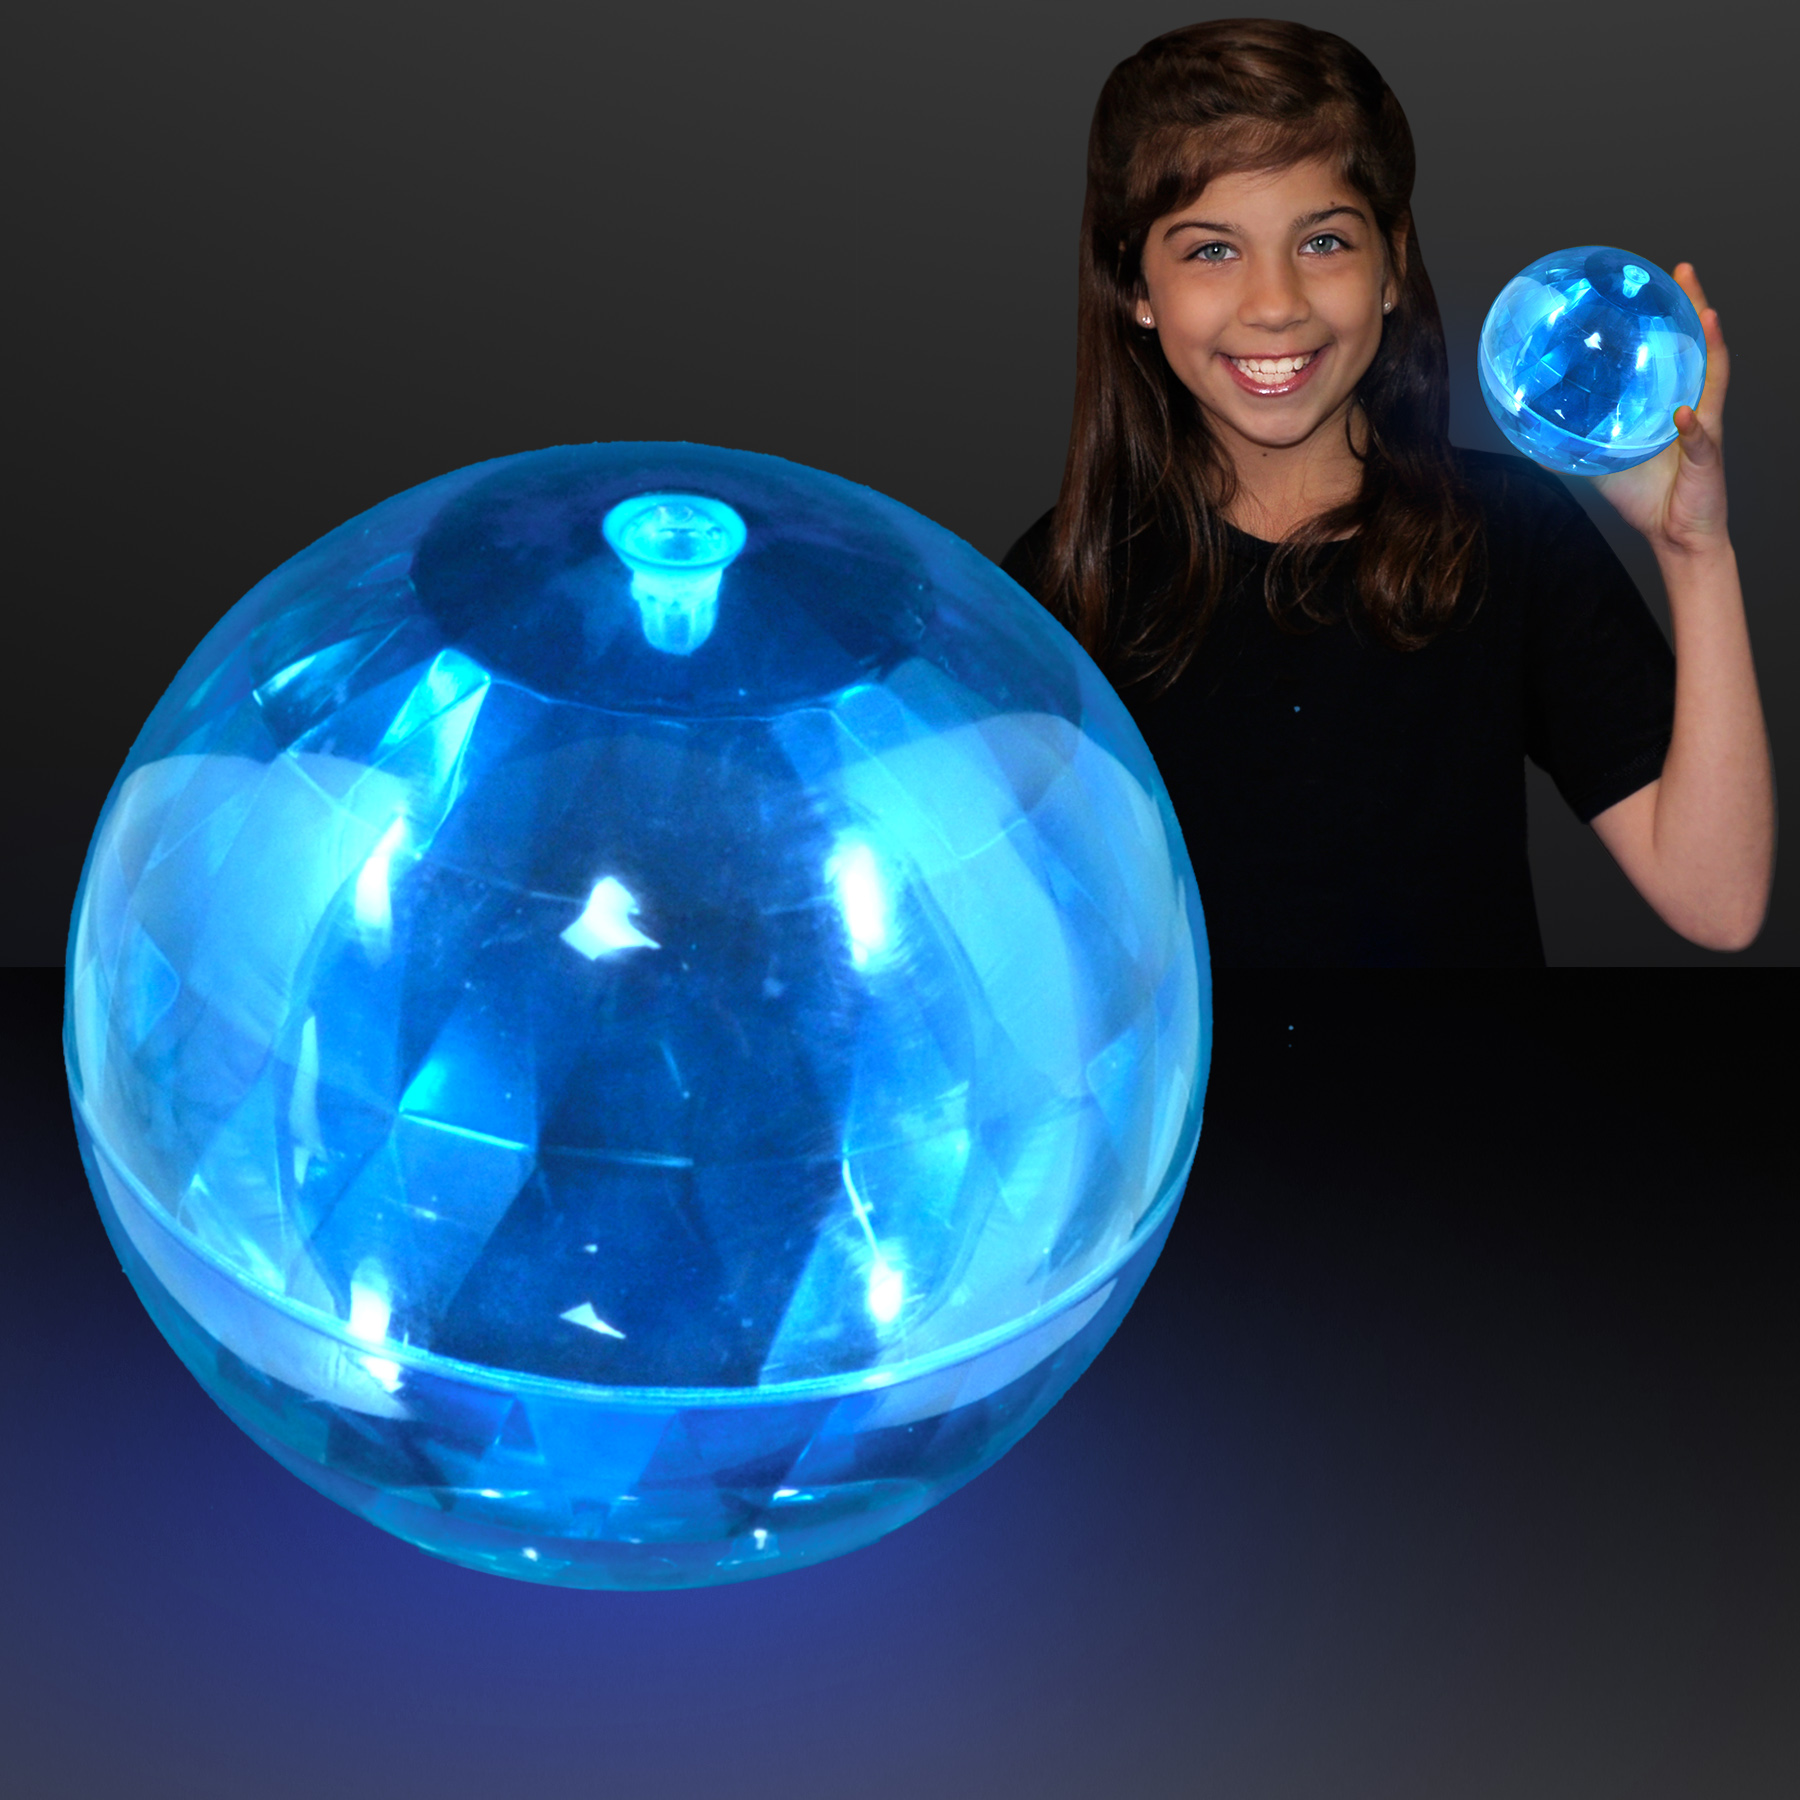 FlashingBlinkyLights 4 Light Up Soft Puffer Balls in